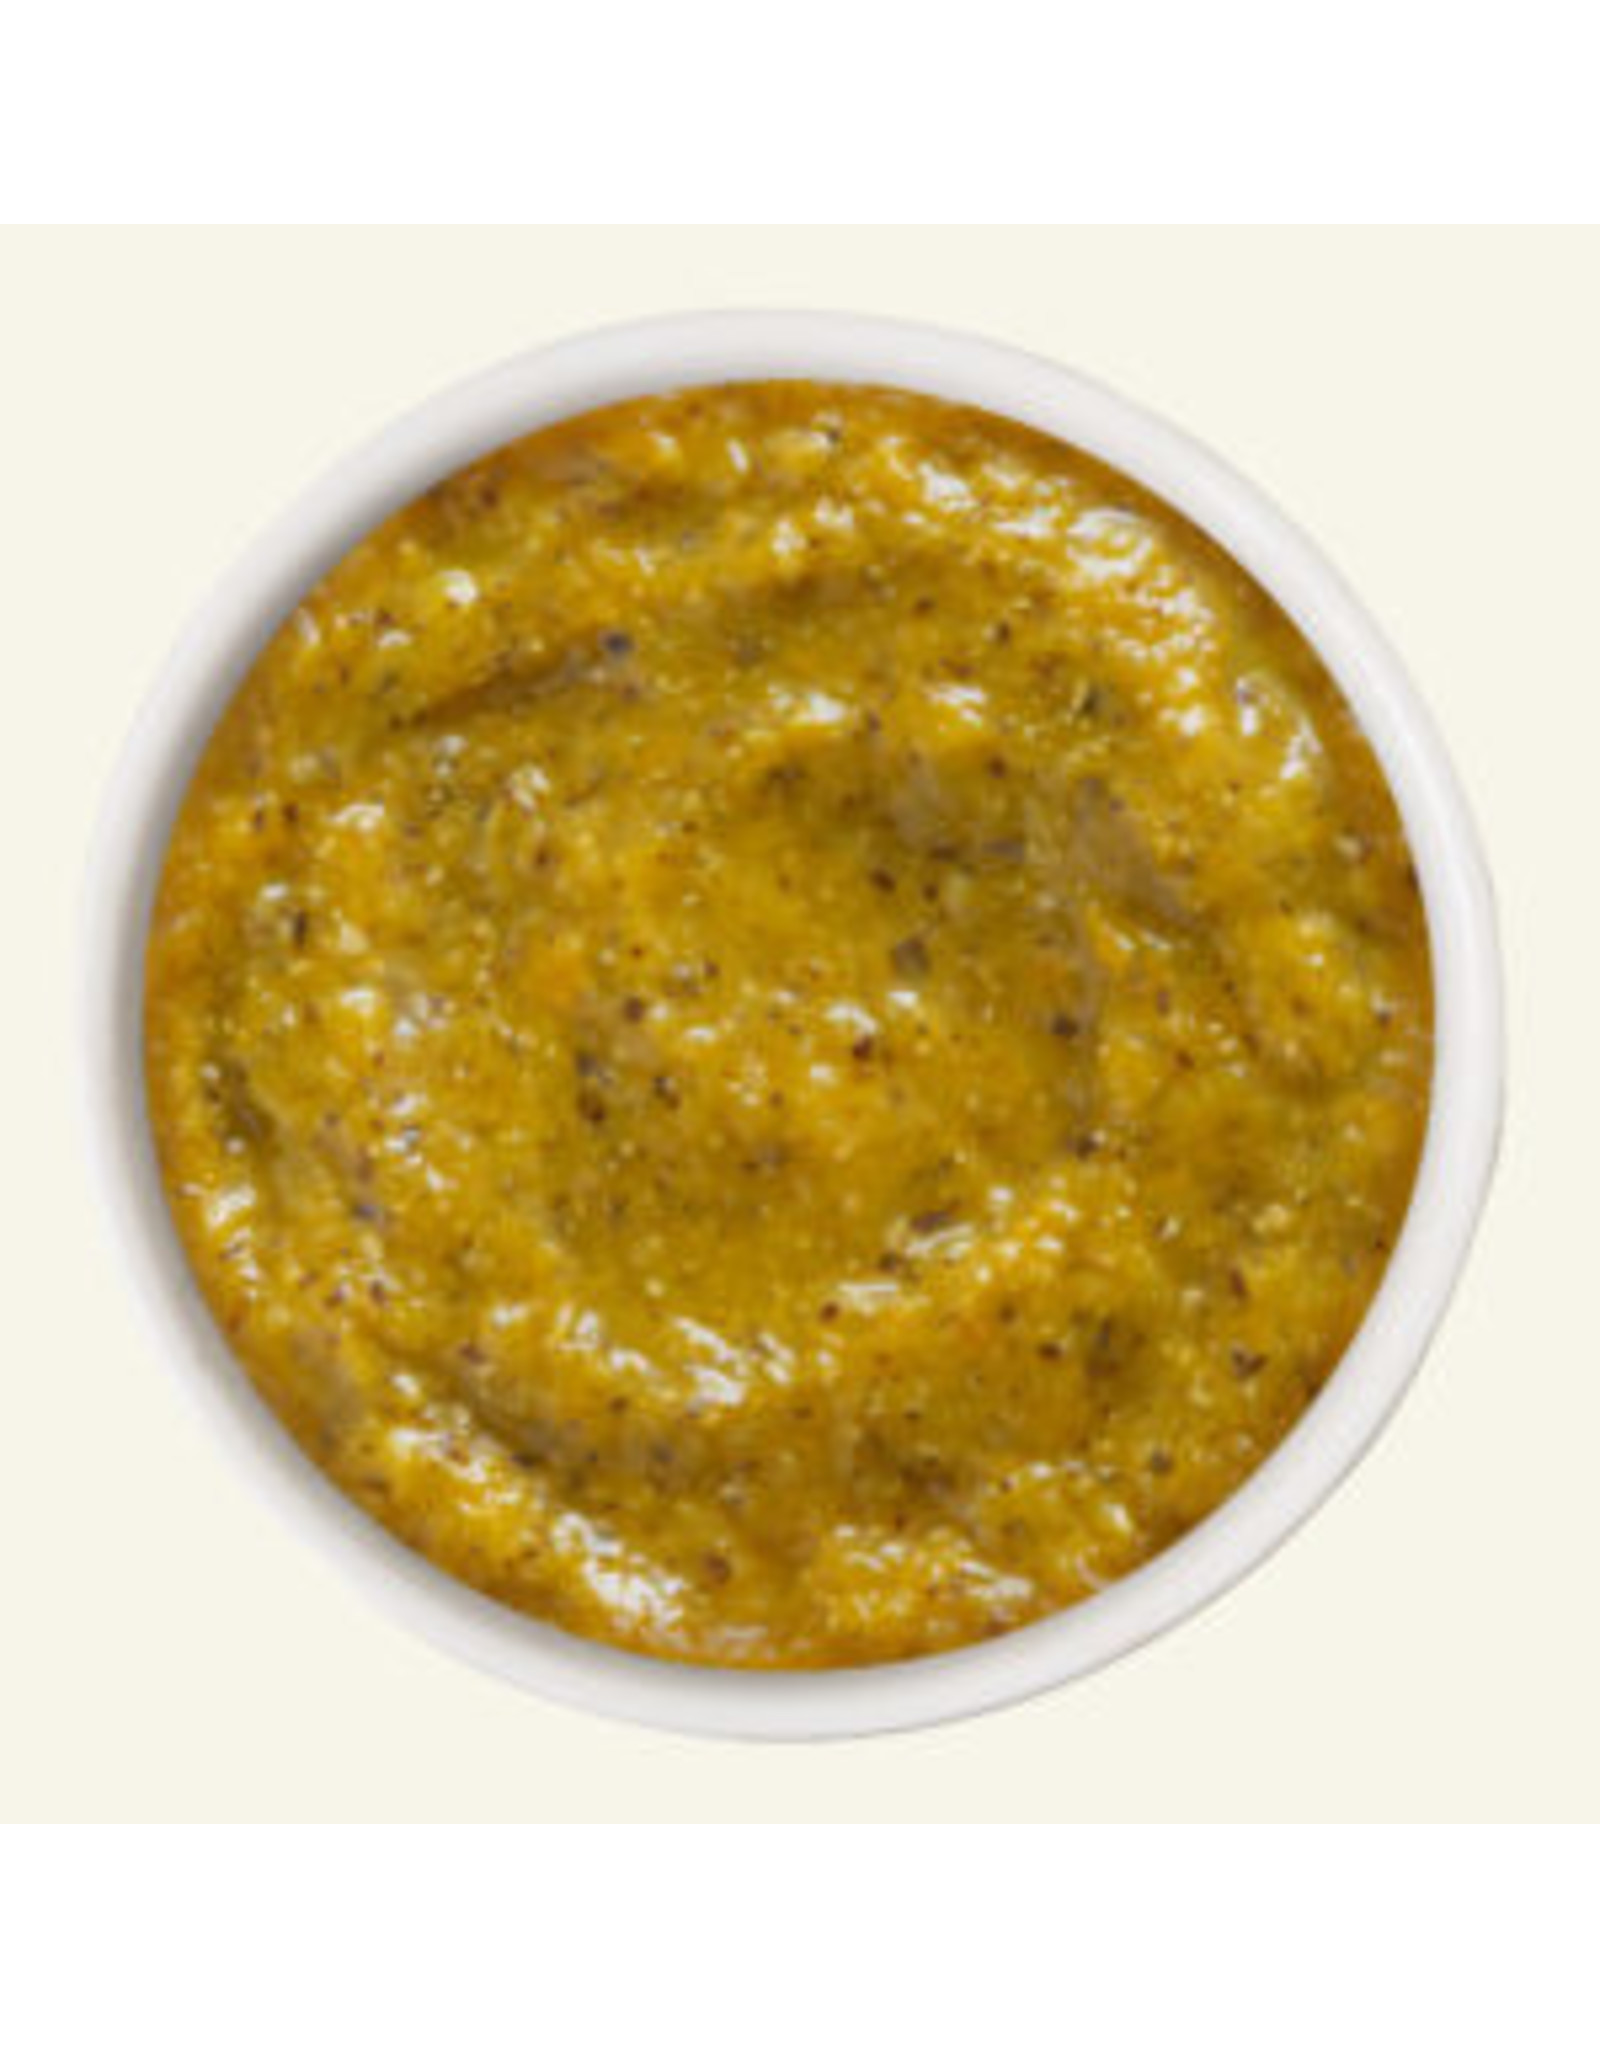 Weruva Weruva Pouch Pumpkin Patch Up Pumpkin Puree plus Coconut Oil & Flaxseed Food Supplement